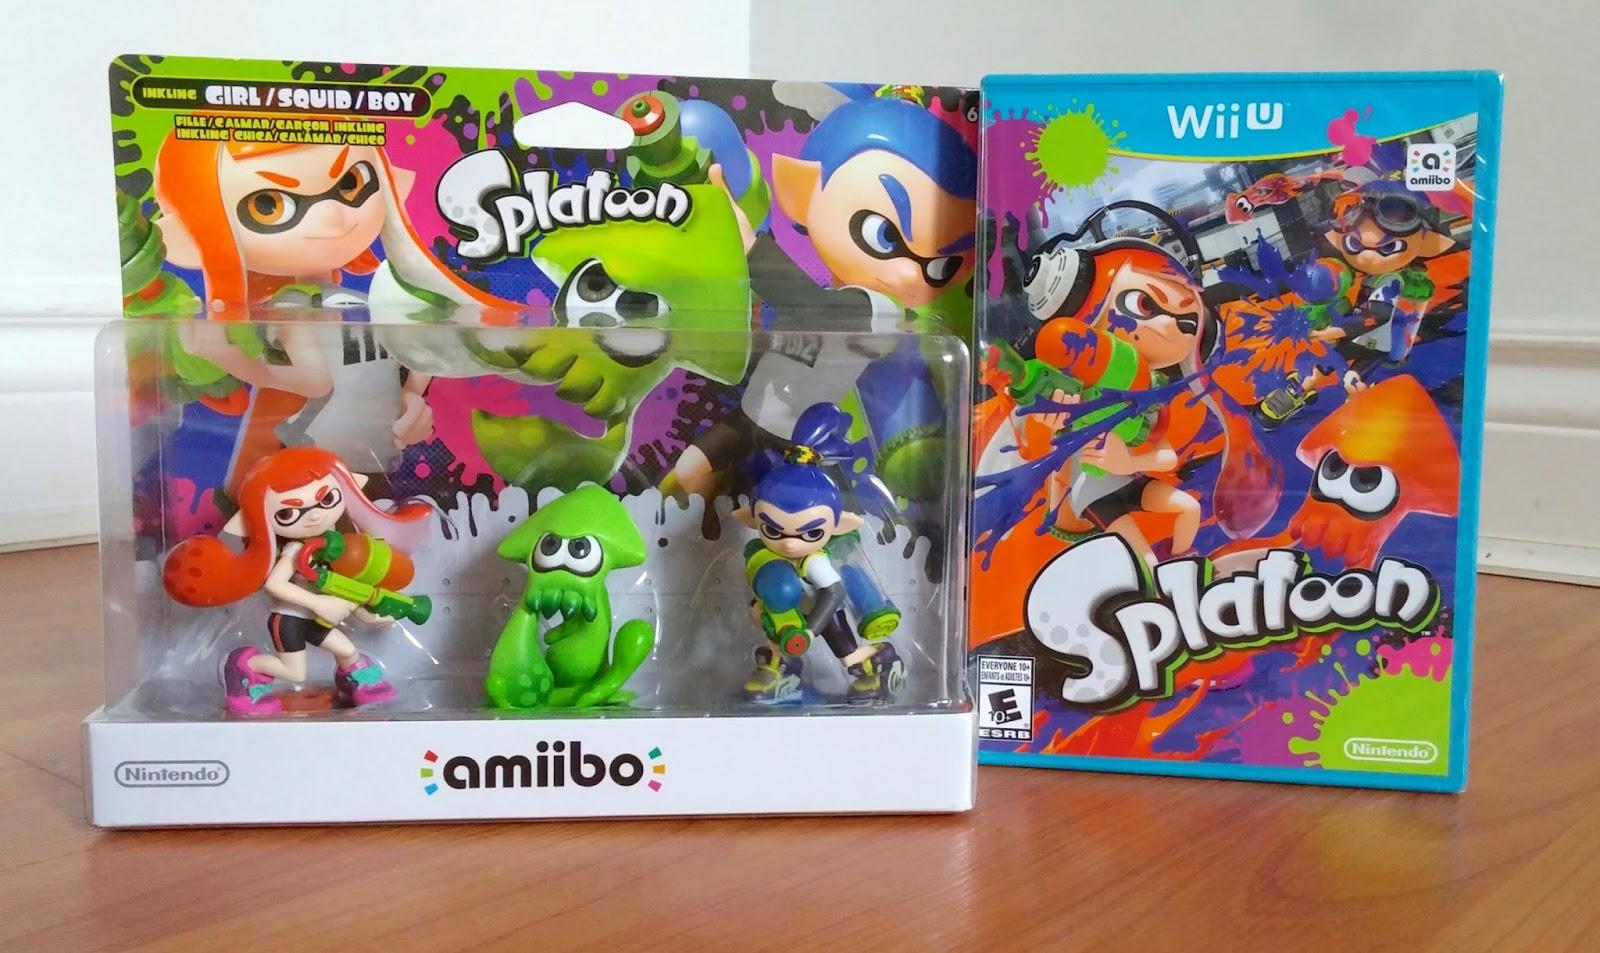 Splatoon Wii U Review: New Squids On The Block | USgamer  |Splatoon Wii